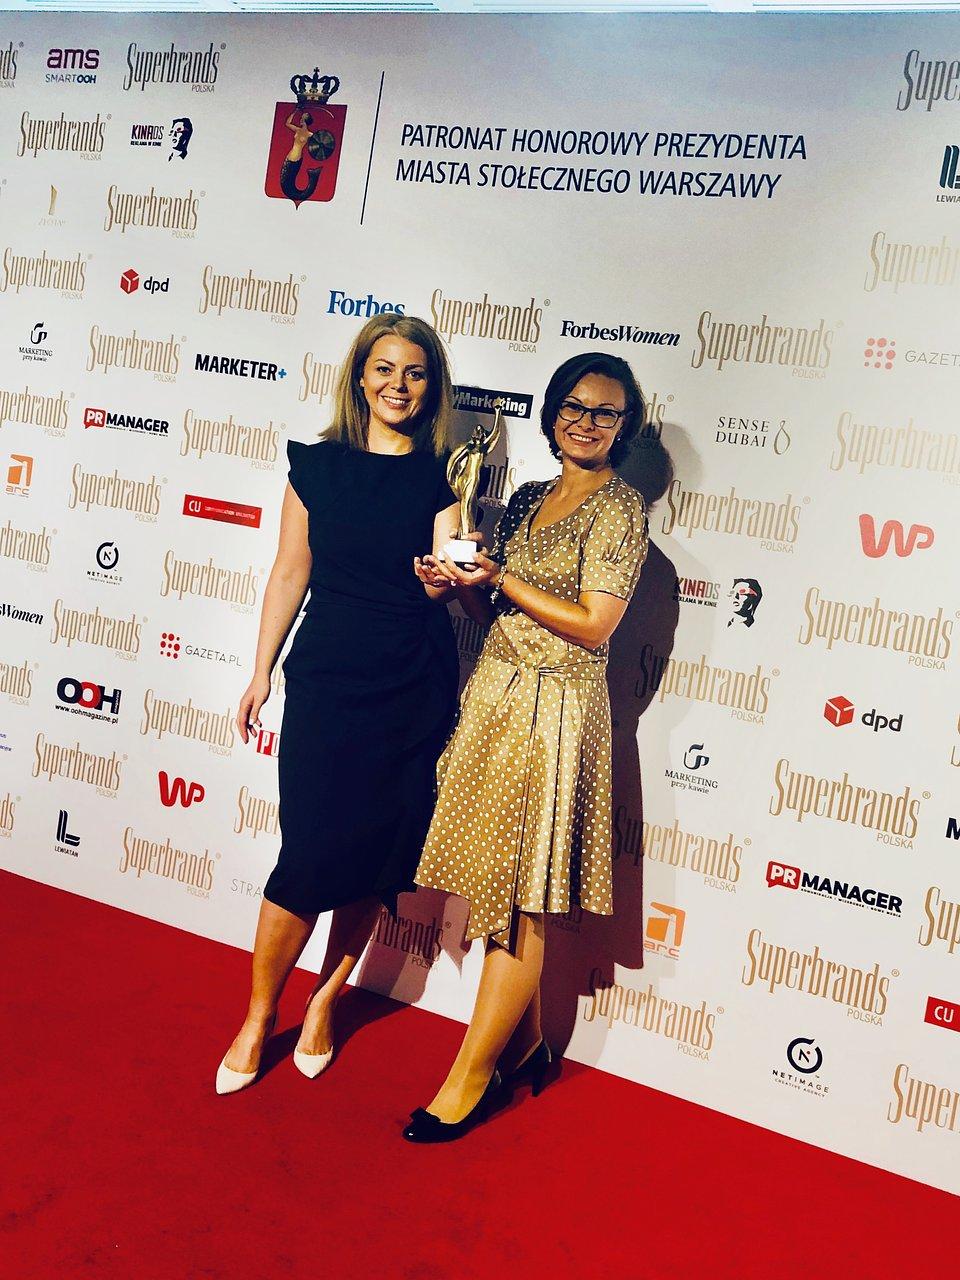 Nagrodę Superbrands 2020 dla marki Continental odebrały Marta Oknińska, Marketing Manager CVT, oraz Ewa Zawadzka, Digital Marketing Manager w Continental Opony Polska